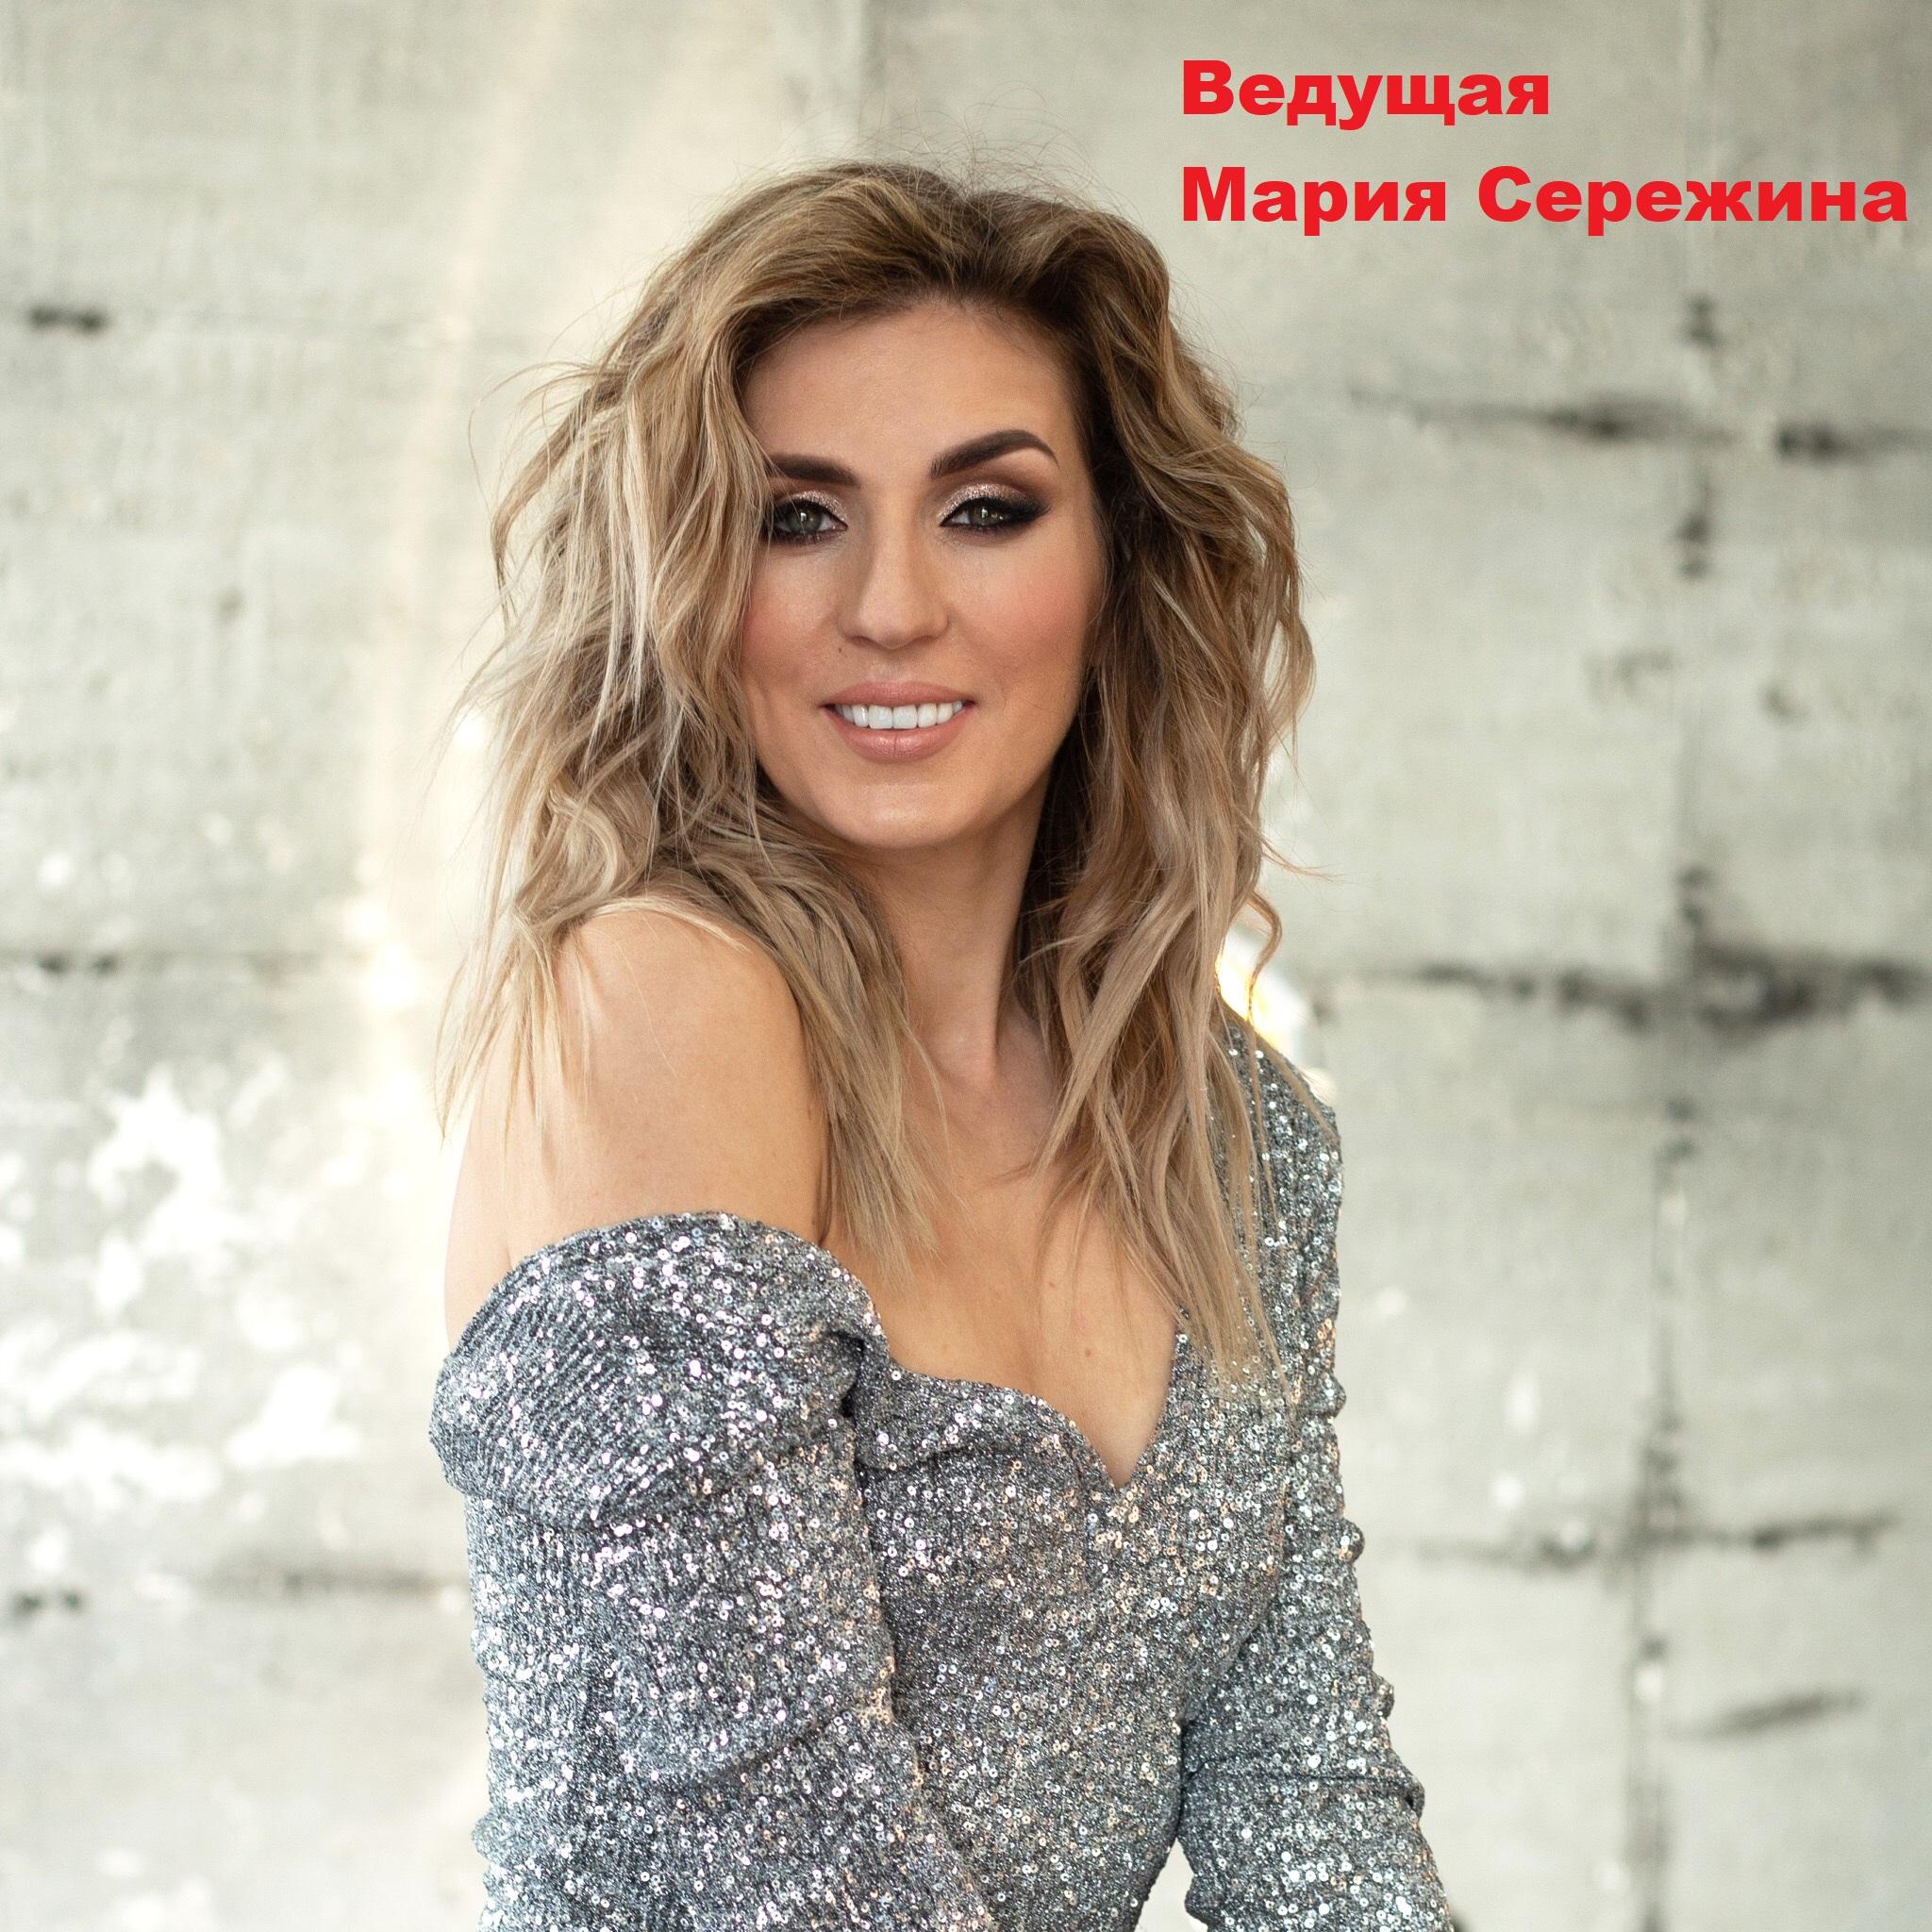 Мария Сережина